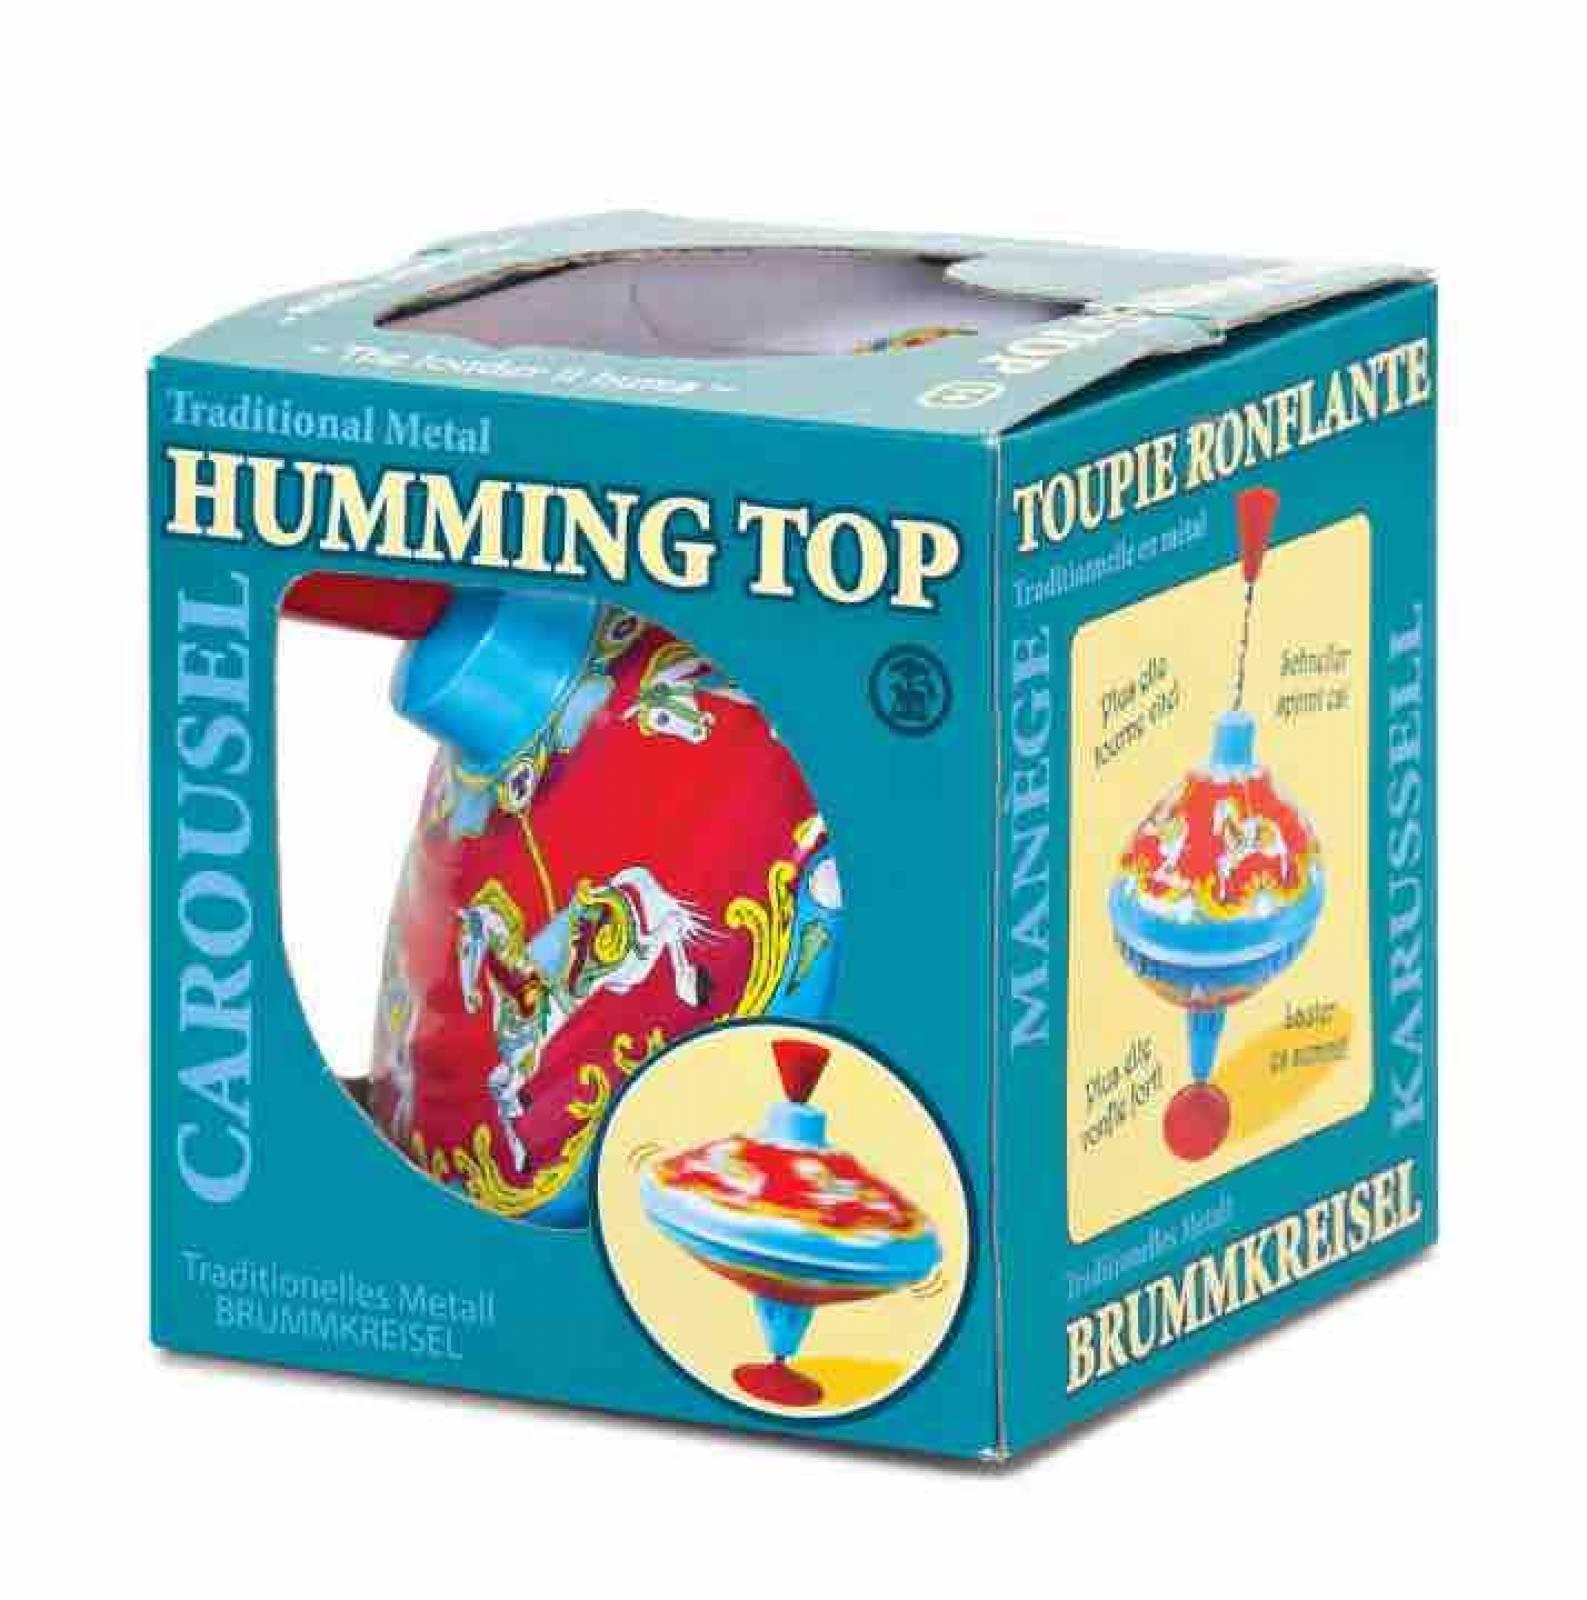 Carousel Metal Humming Top 1+ thumbnails